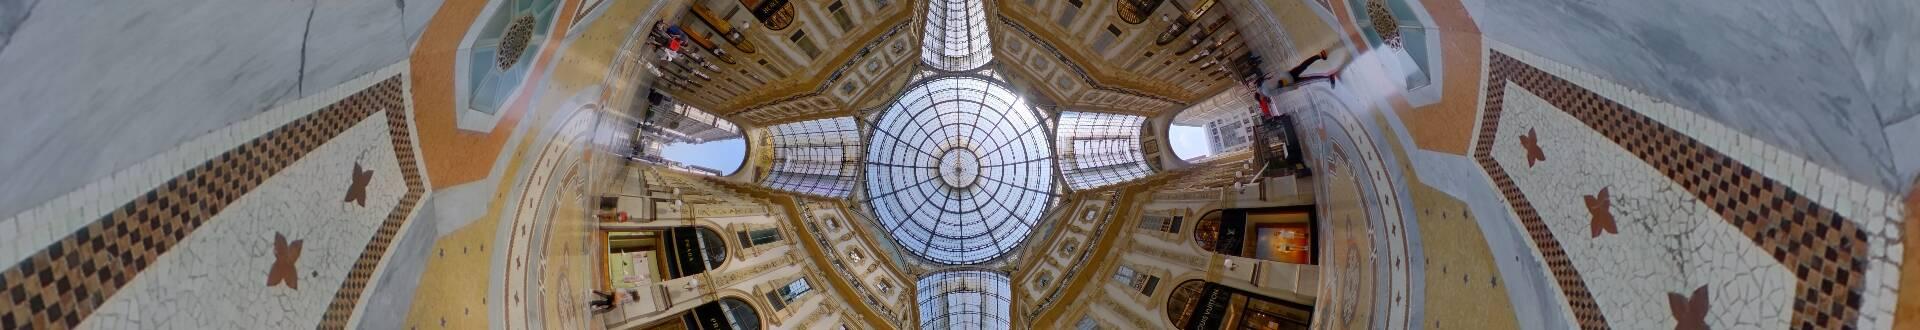 Matteo Capuzzi   Milan Italy   360 3D VR tours